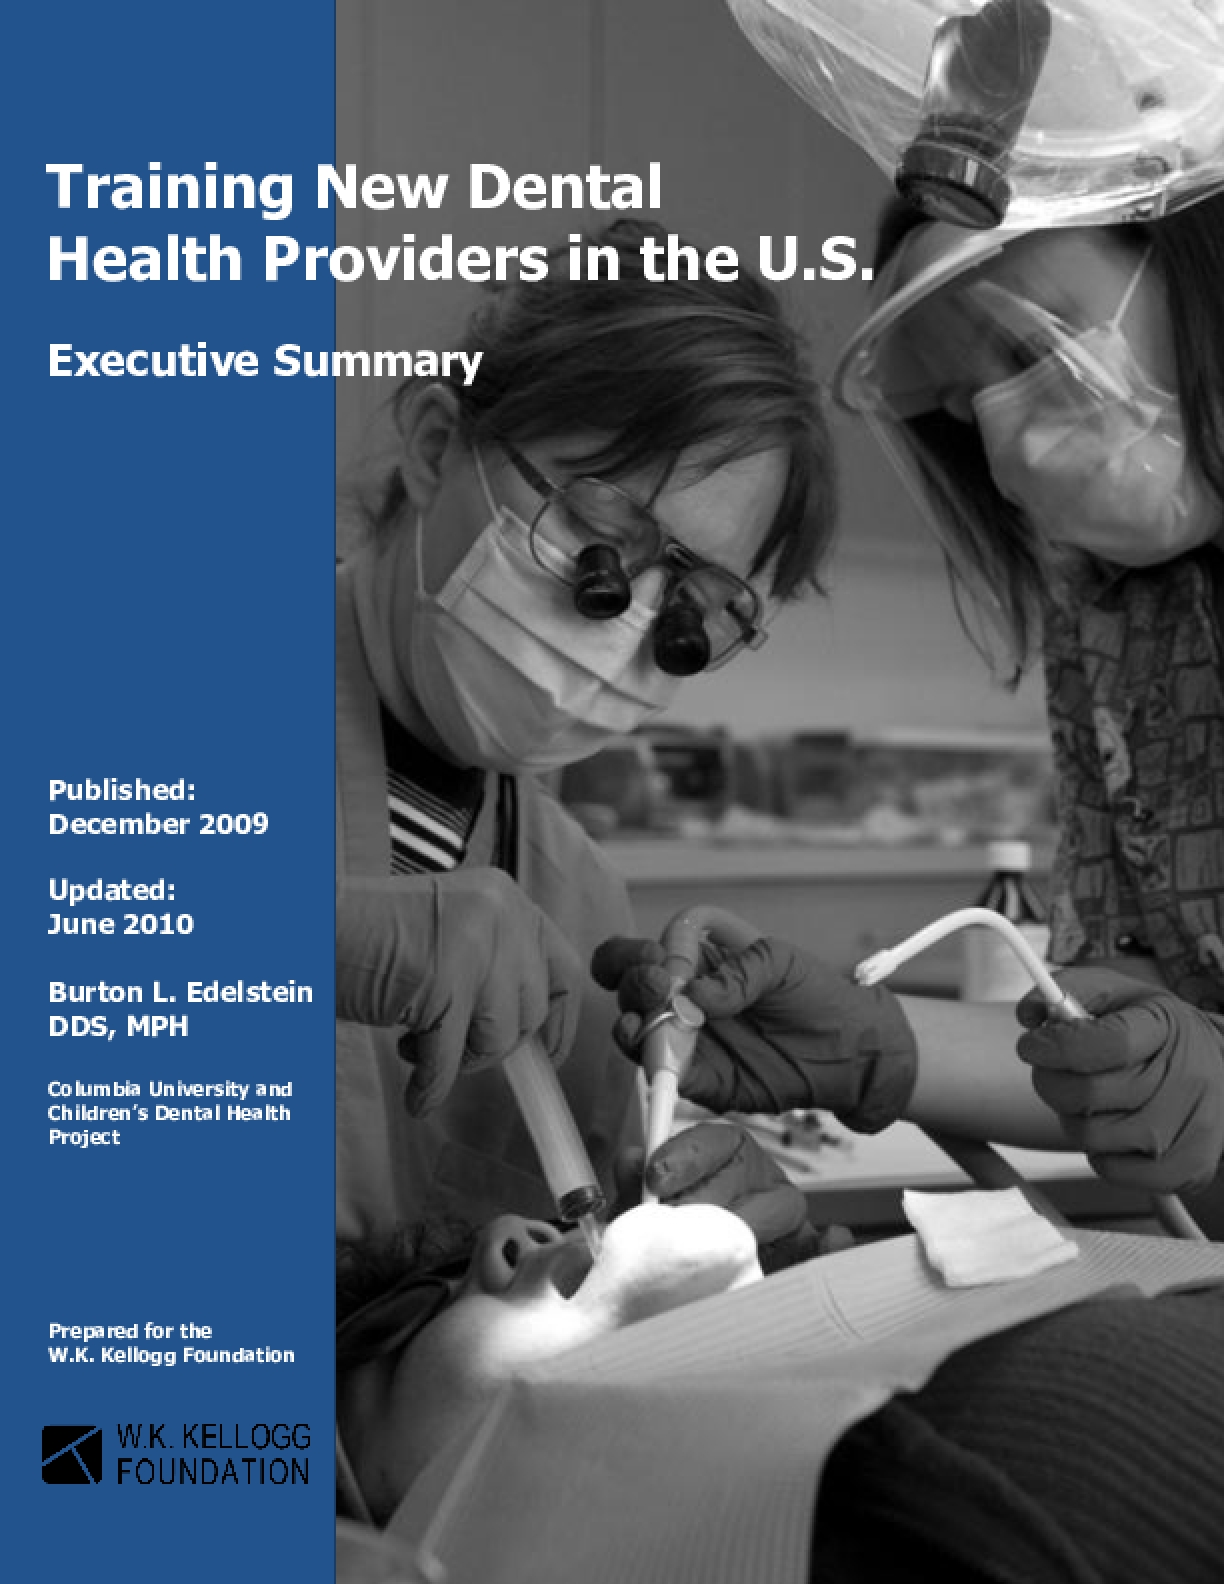 Training New Dental Health Providers in the U.S. (Executive Summary)